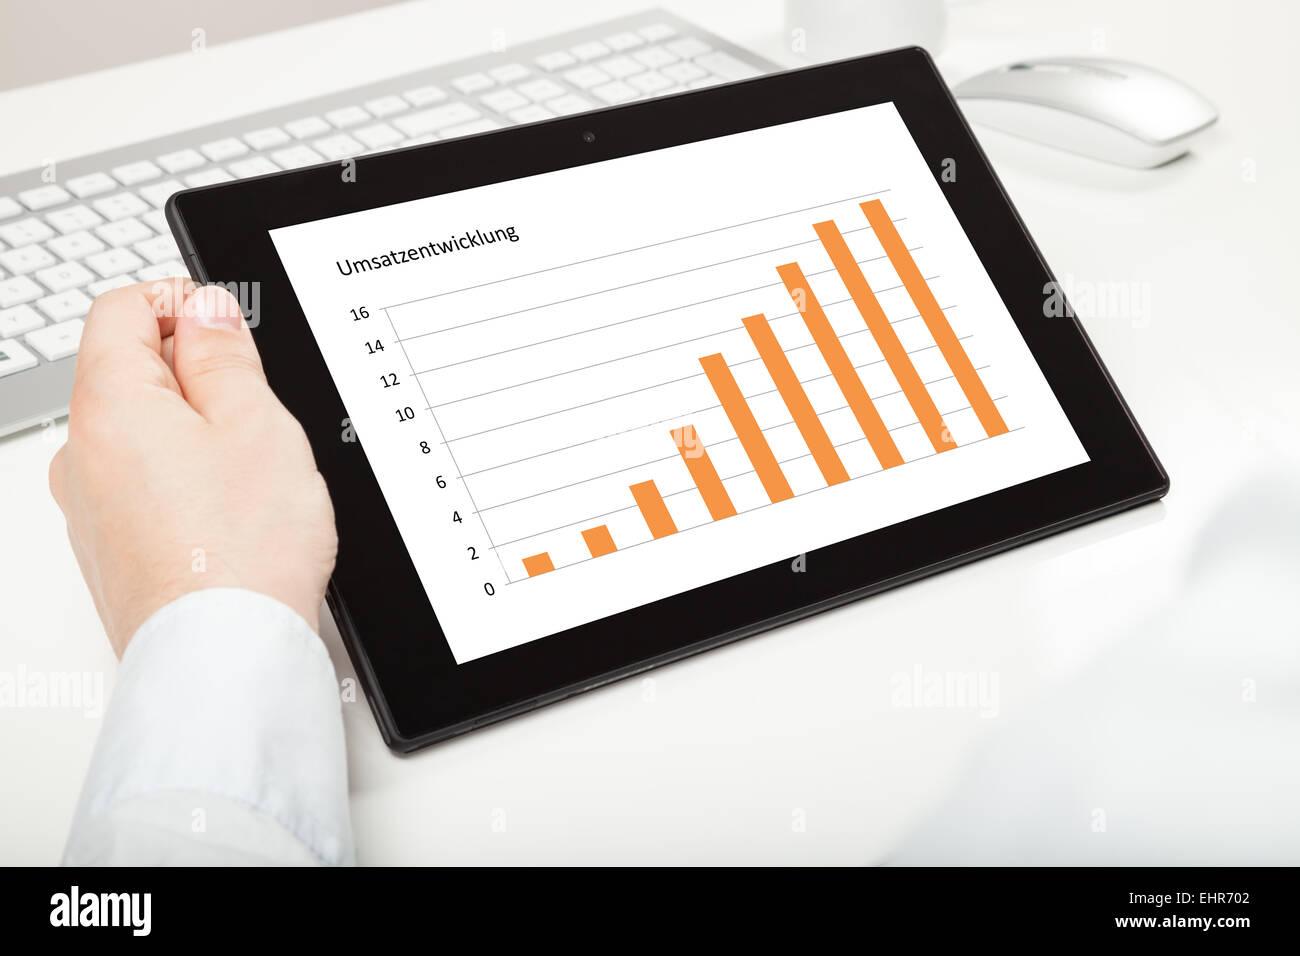 development of sales (german) on tablet - Stock Image